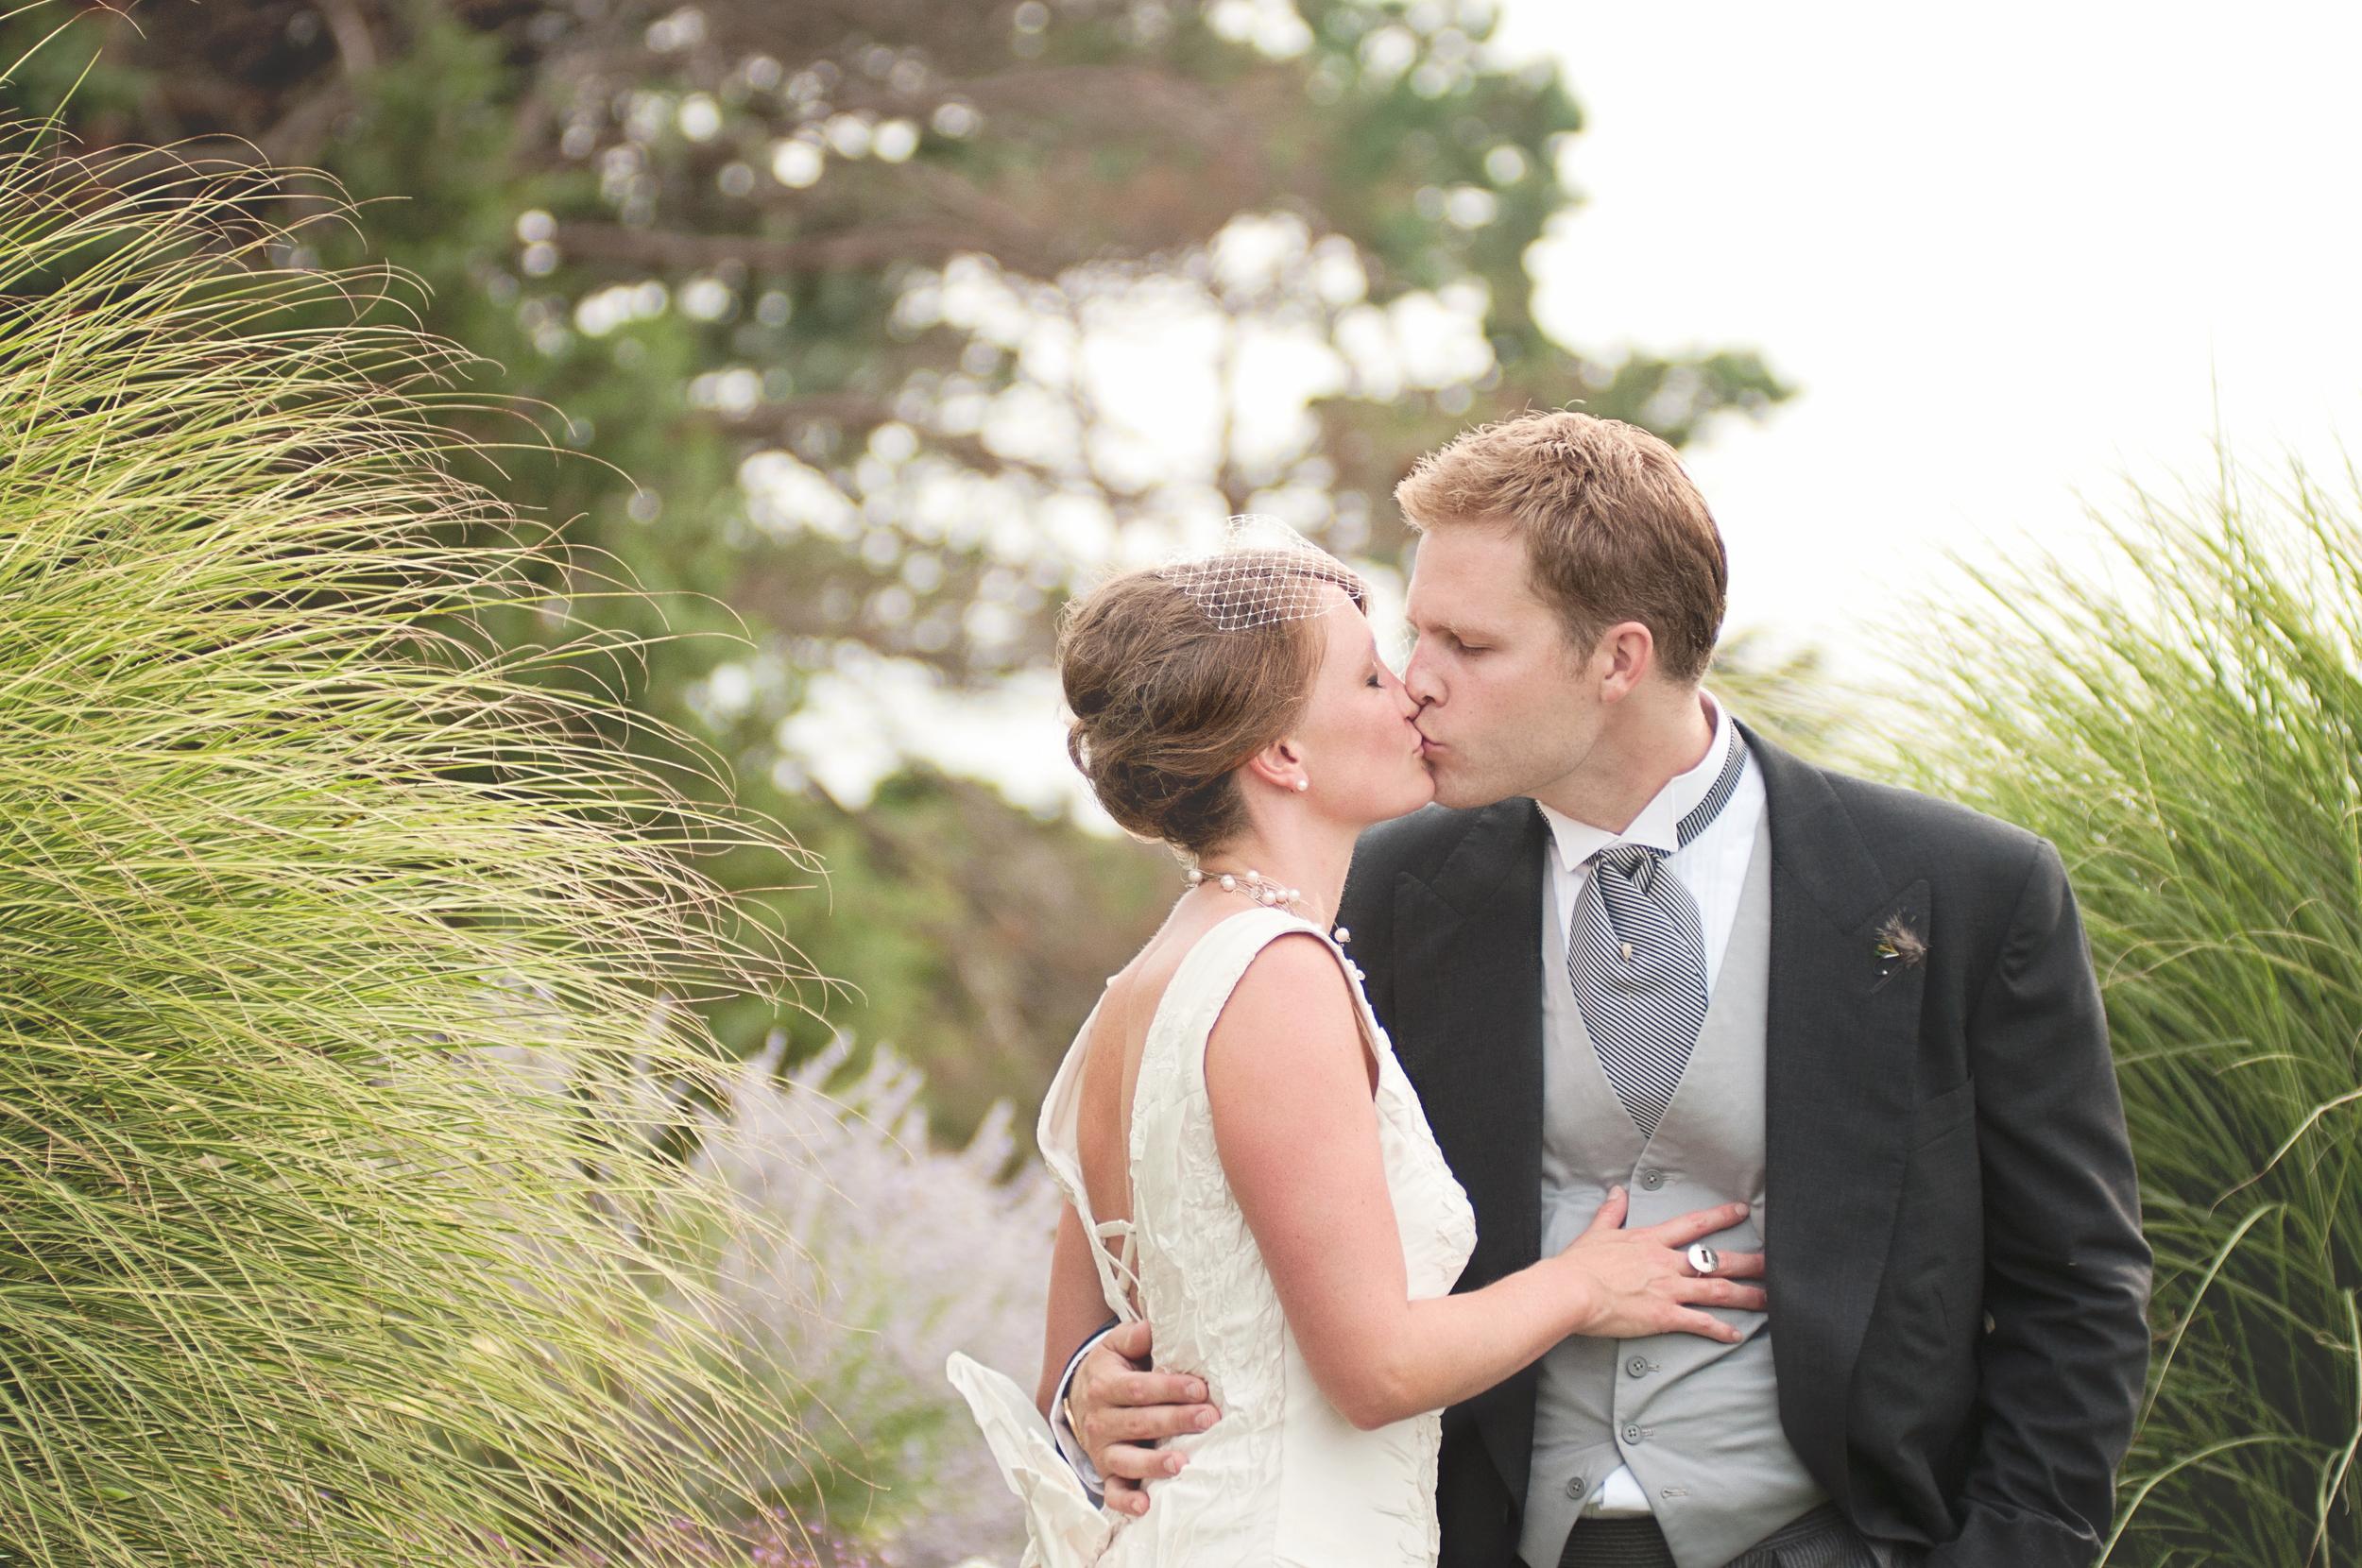 Angela_Chicoski_CT_wedding_photographer_093.jpg